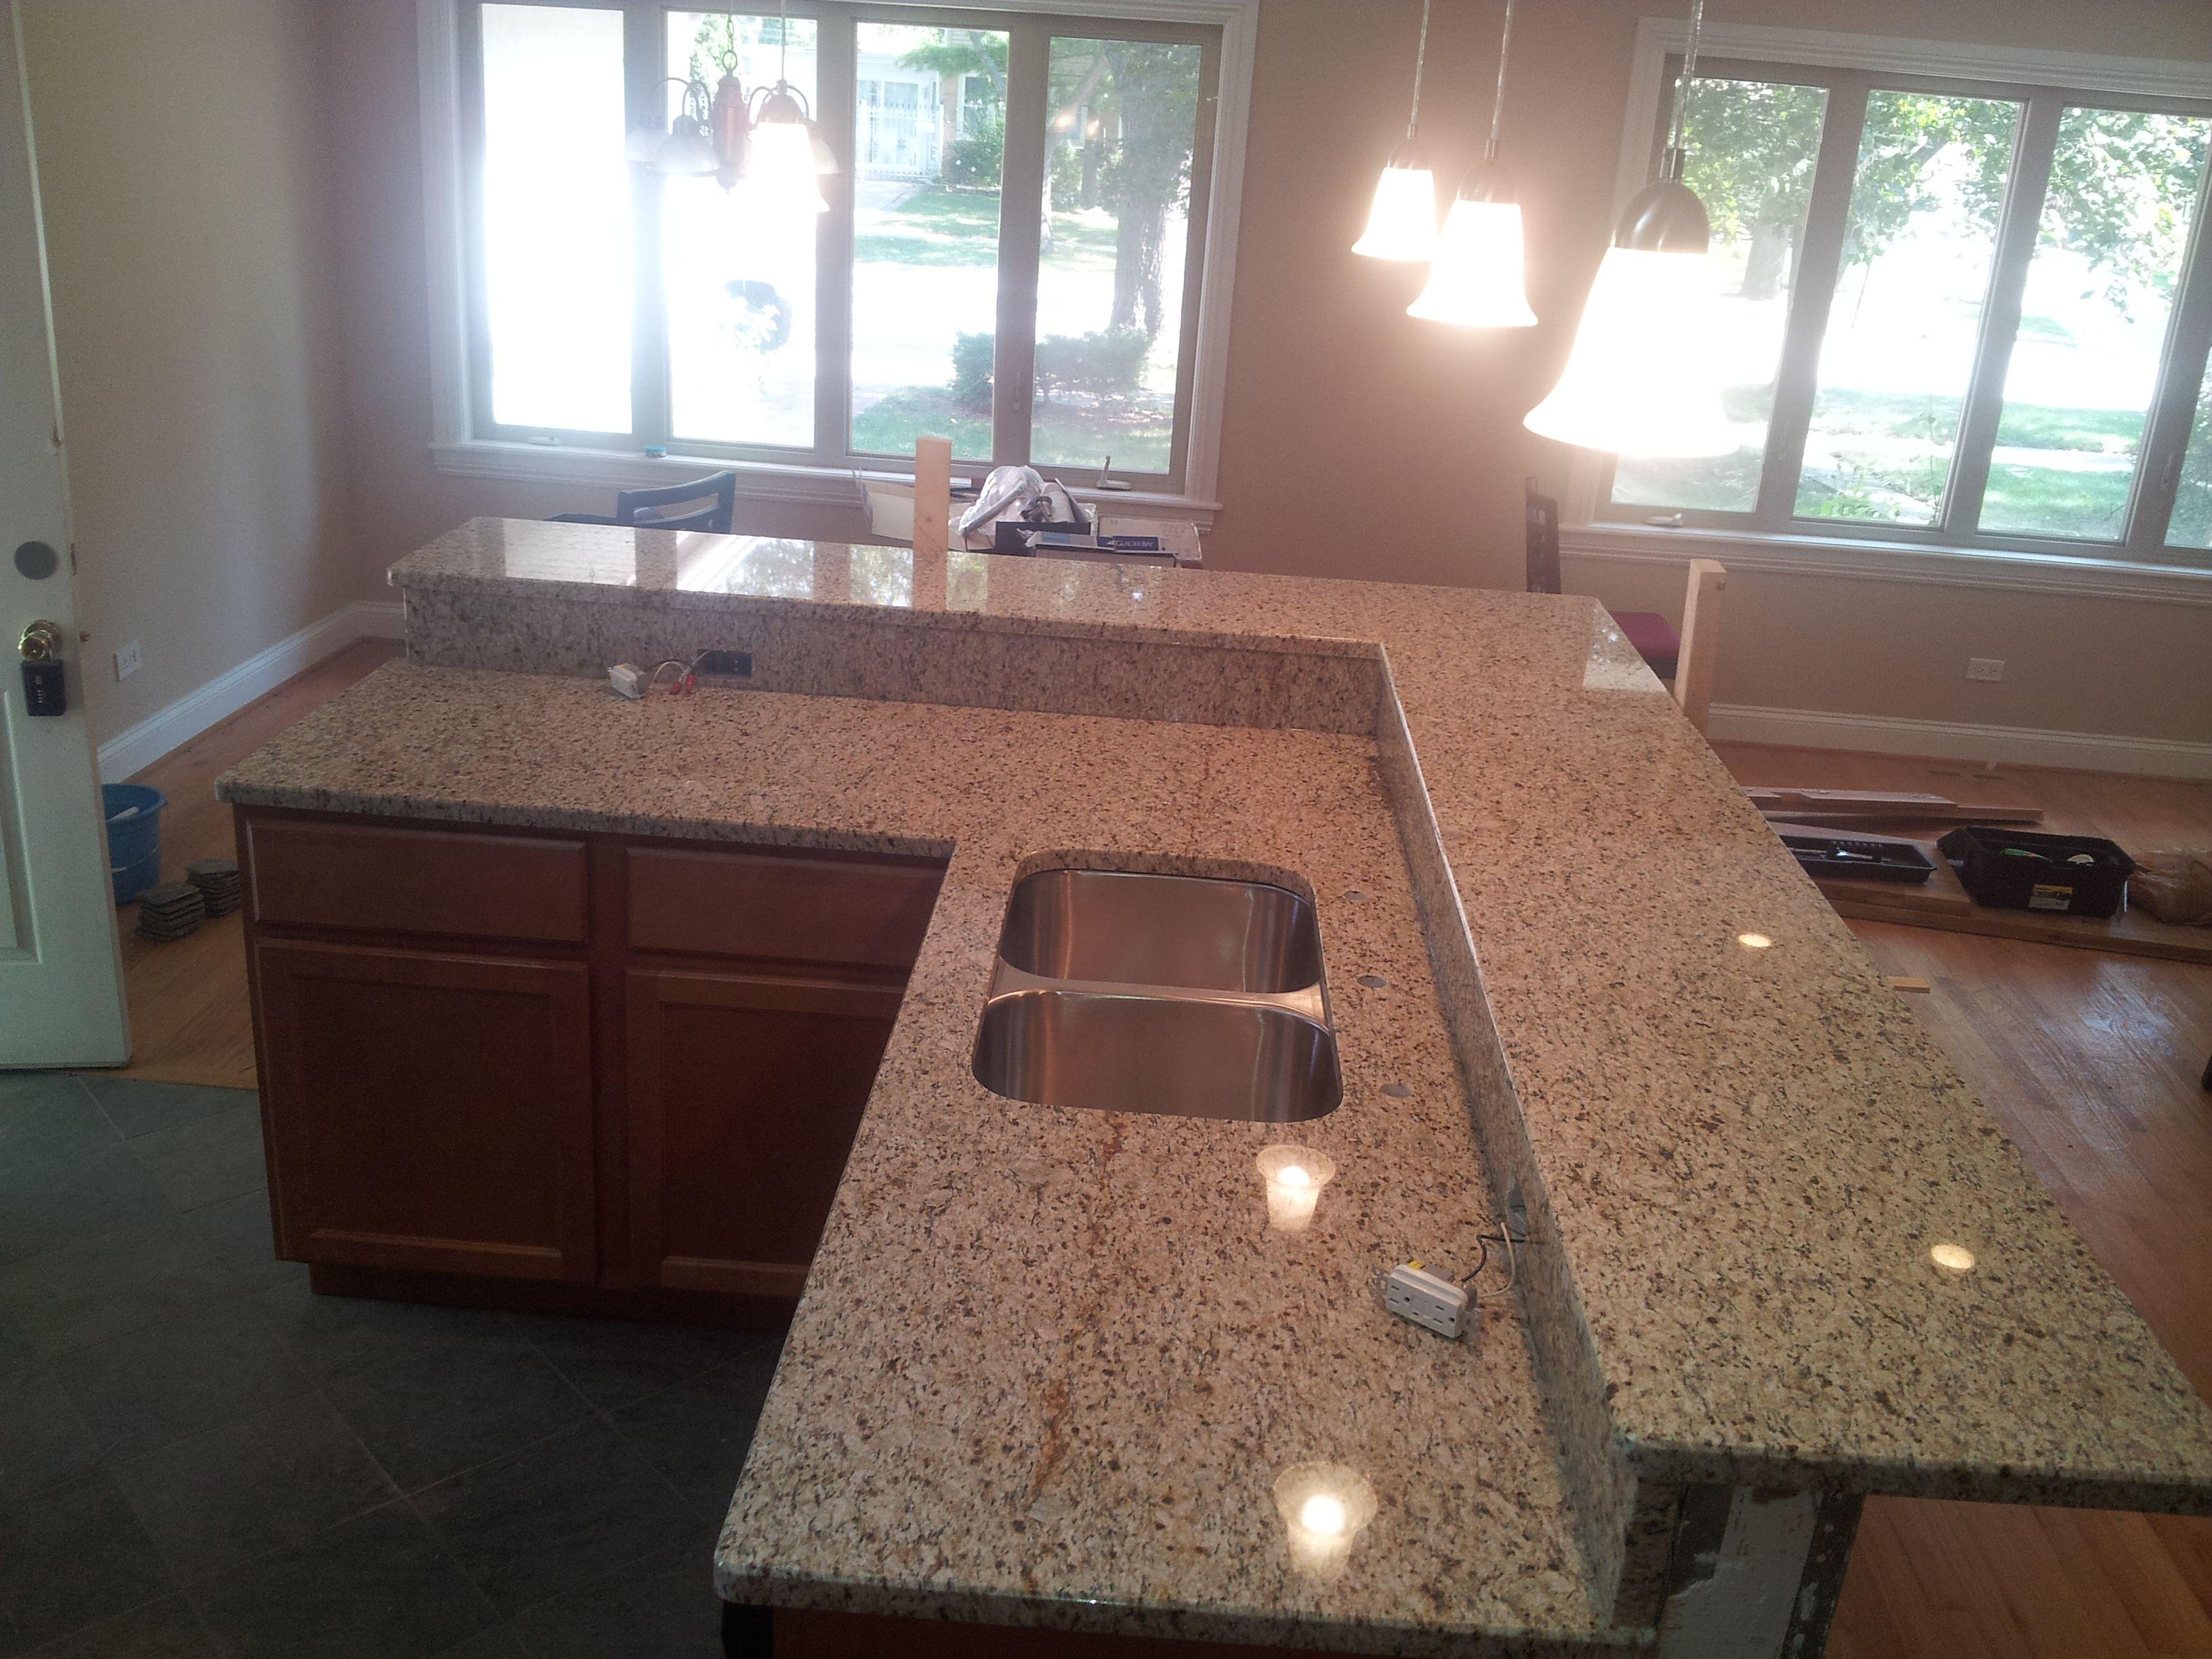 Art Granite Countertops Inc. 1020 Lunt Ave . Unit F Schaumburg IL , 60193  Tel